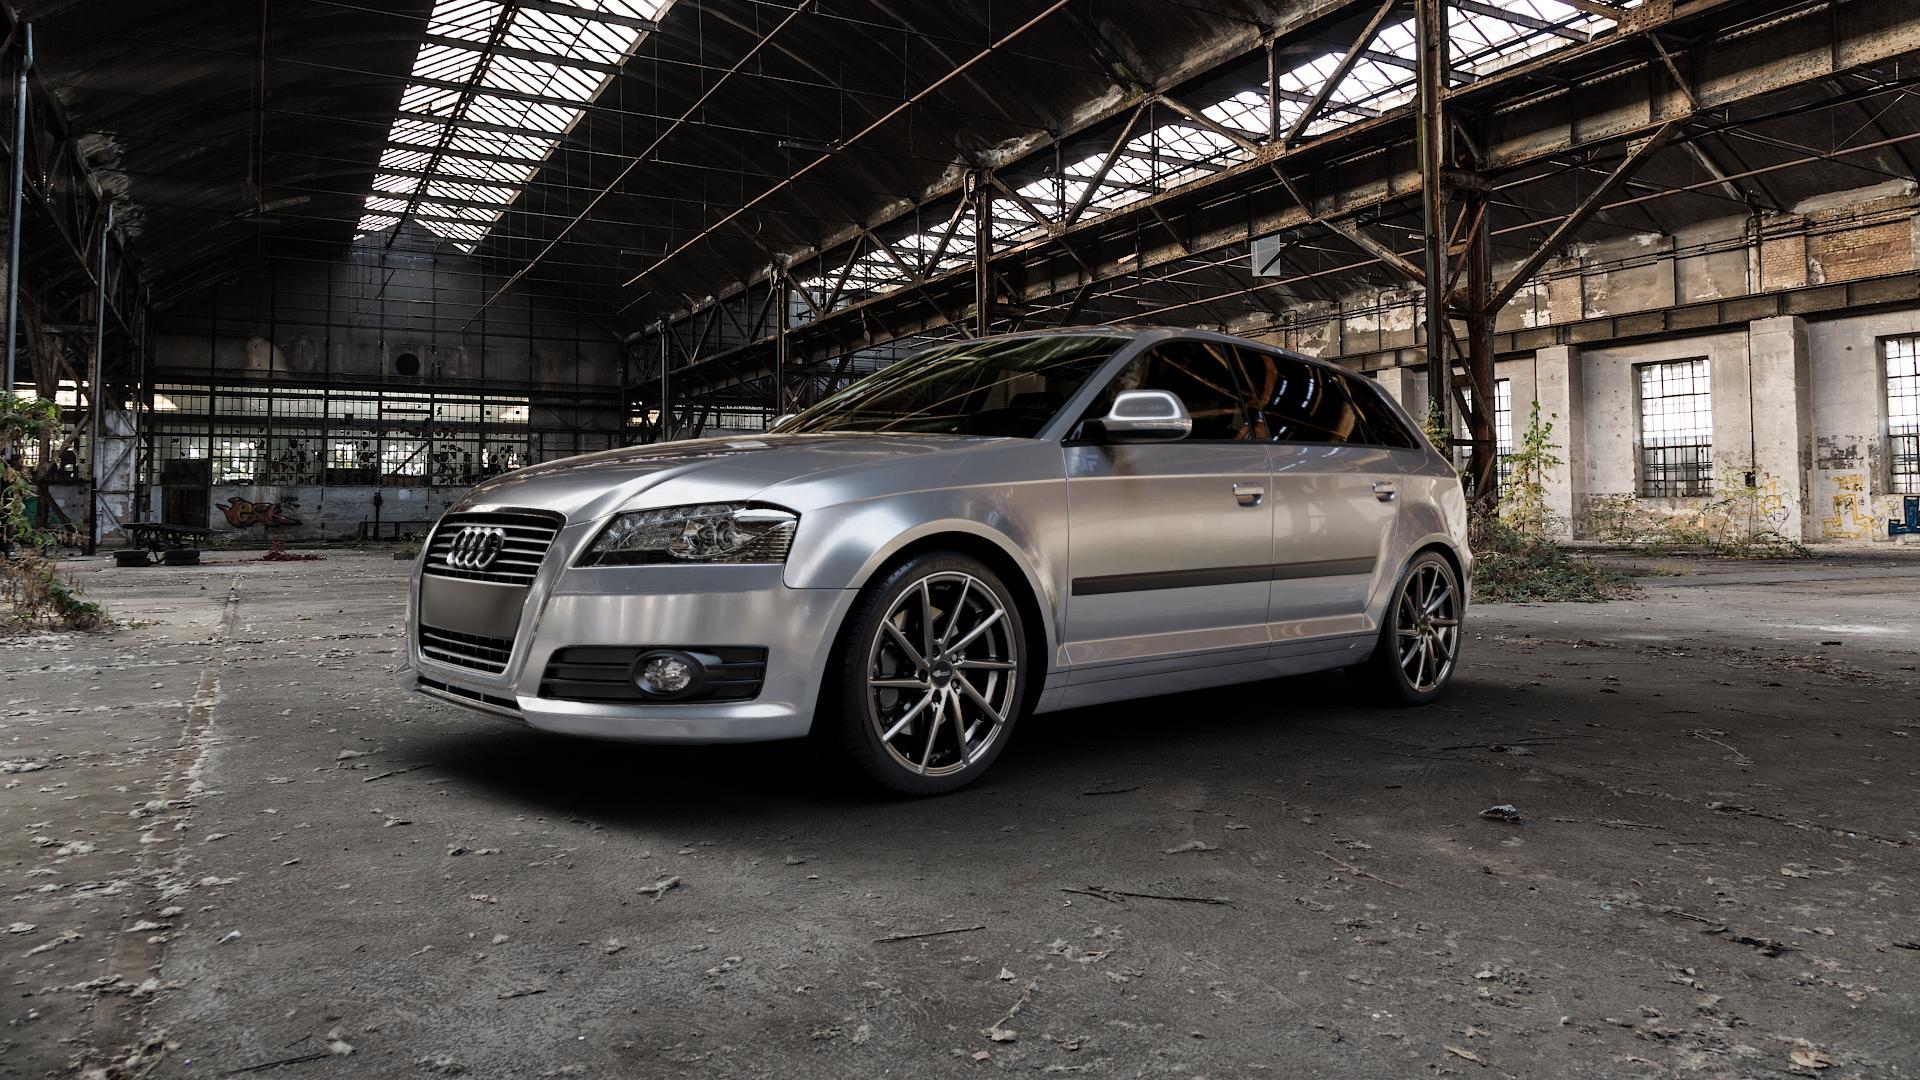 Brock B37 dark-sparkle lackiert Felge mit Reifen grau in 18Zoll Winterfelge Alufelge auf silbernem Audi A3 Typ 8P (Sportback) 1,6l 75kW (102 PS) 2,0l FSI 110kW (150 1,9l TDI 77kW (105 103kW (140 TFSI 147kW (200 85kW (116 100kW (136 1,8l 118kW (160 125kW (170 1,4l 92kW (125 120kW (163 quattro 3,2l V6 184kW (250 S3 195kW (265 1,2l 66kW (90